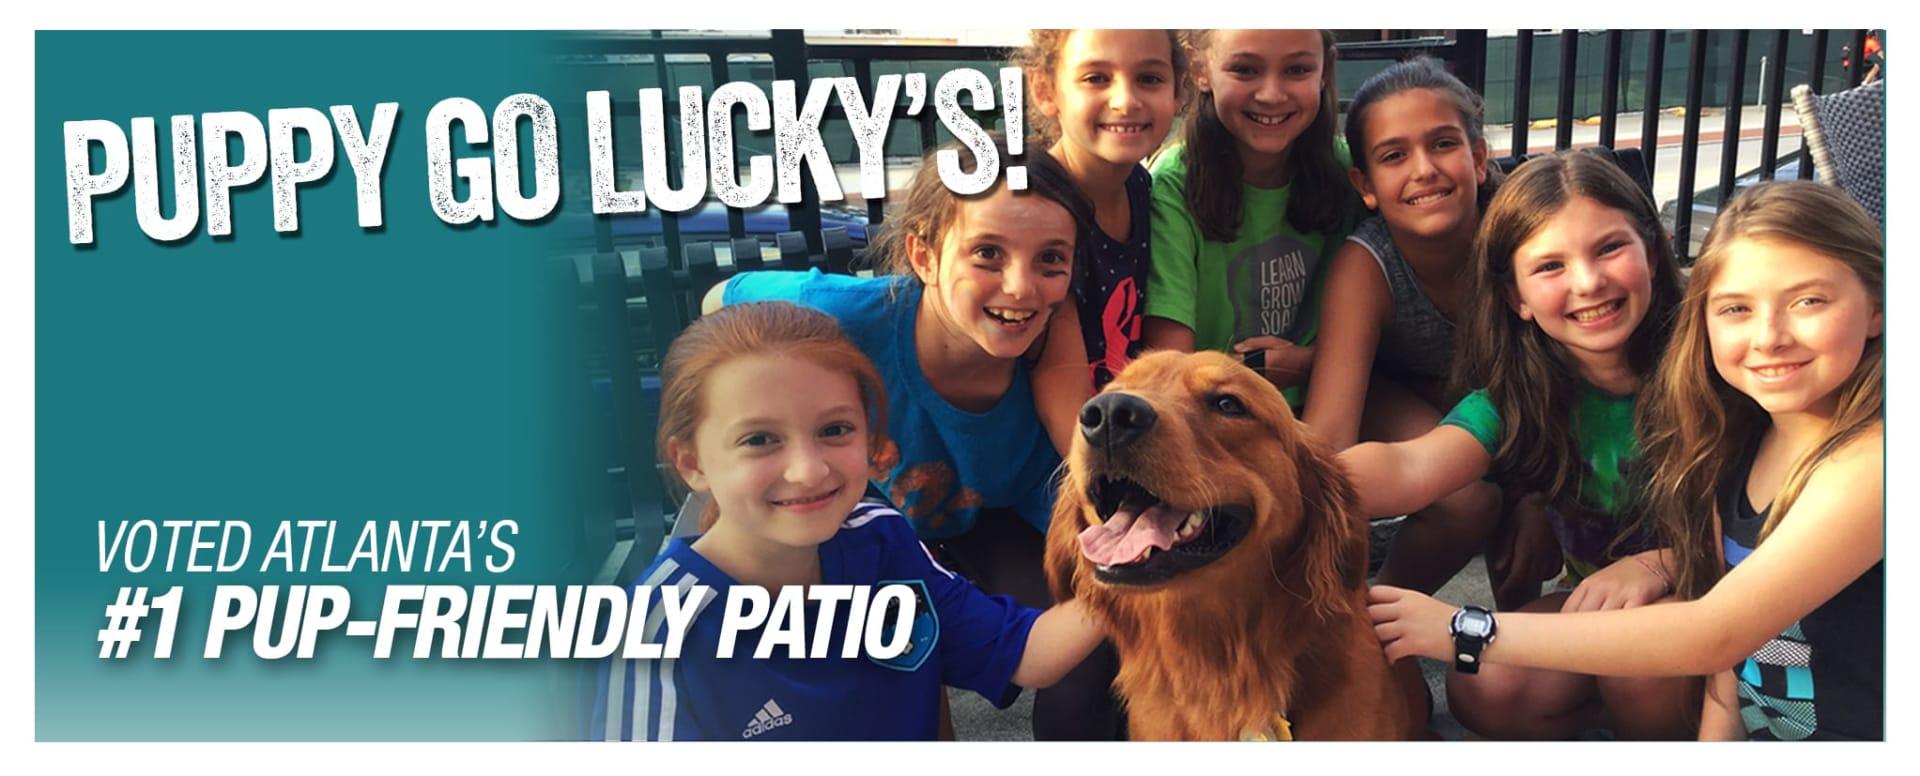 Puppy Go Lucky